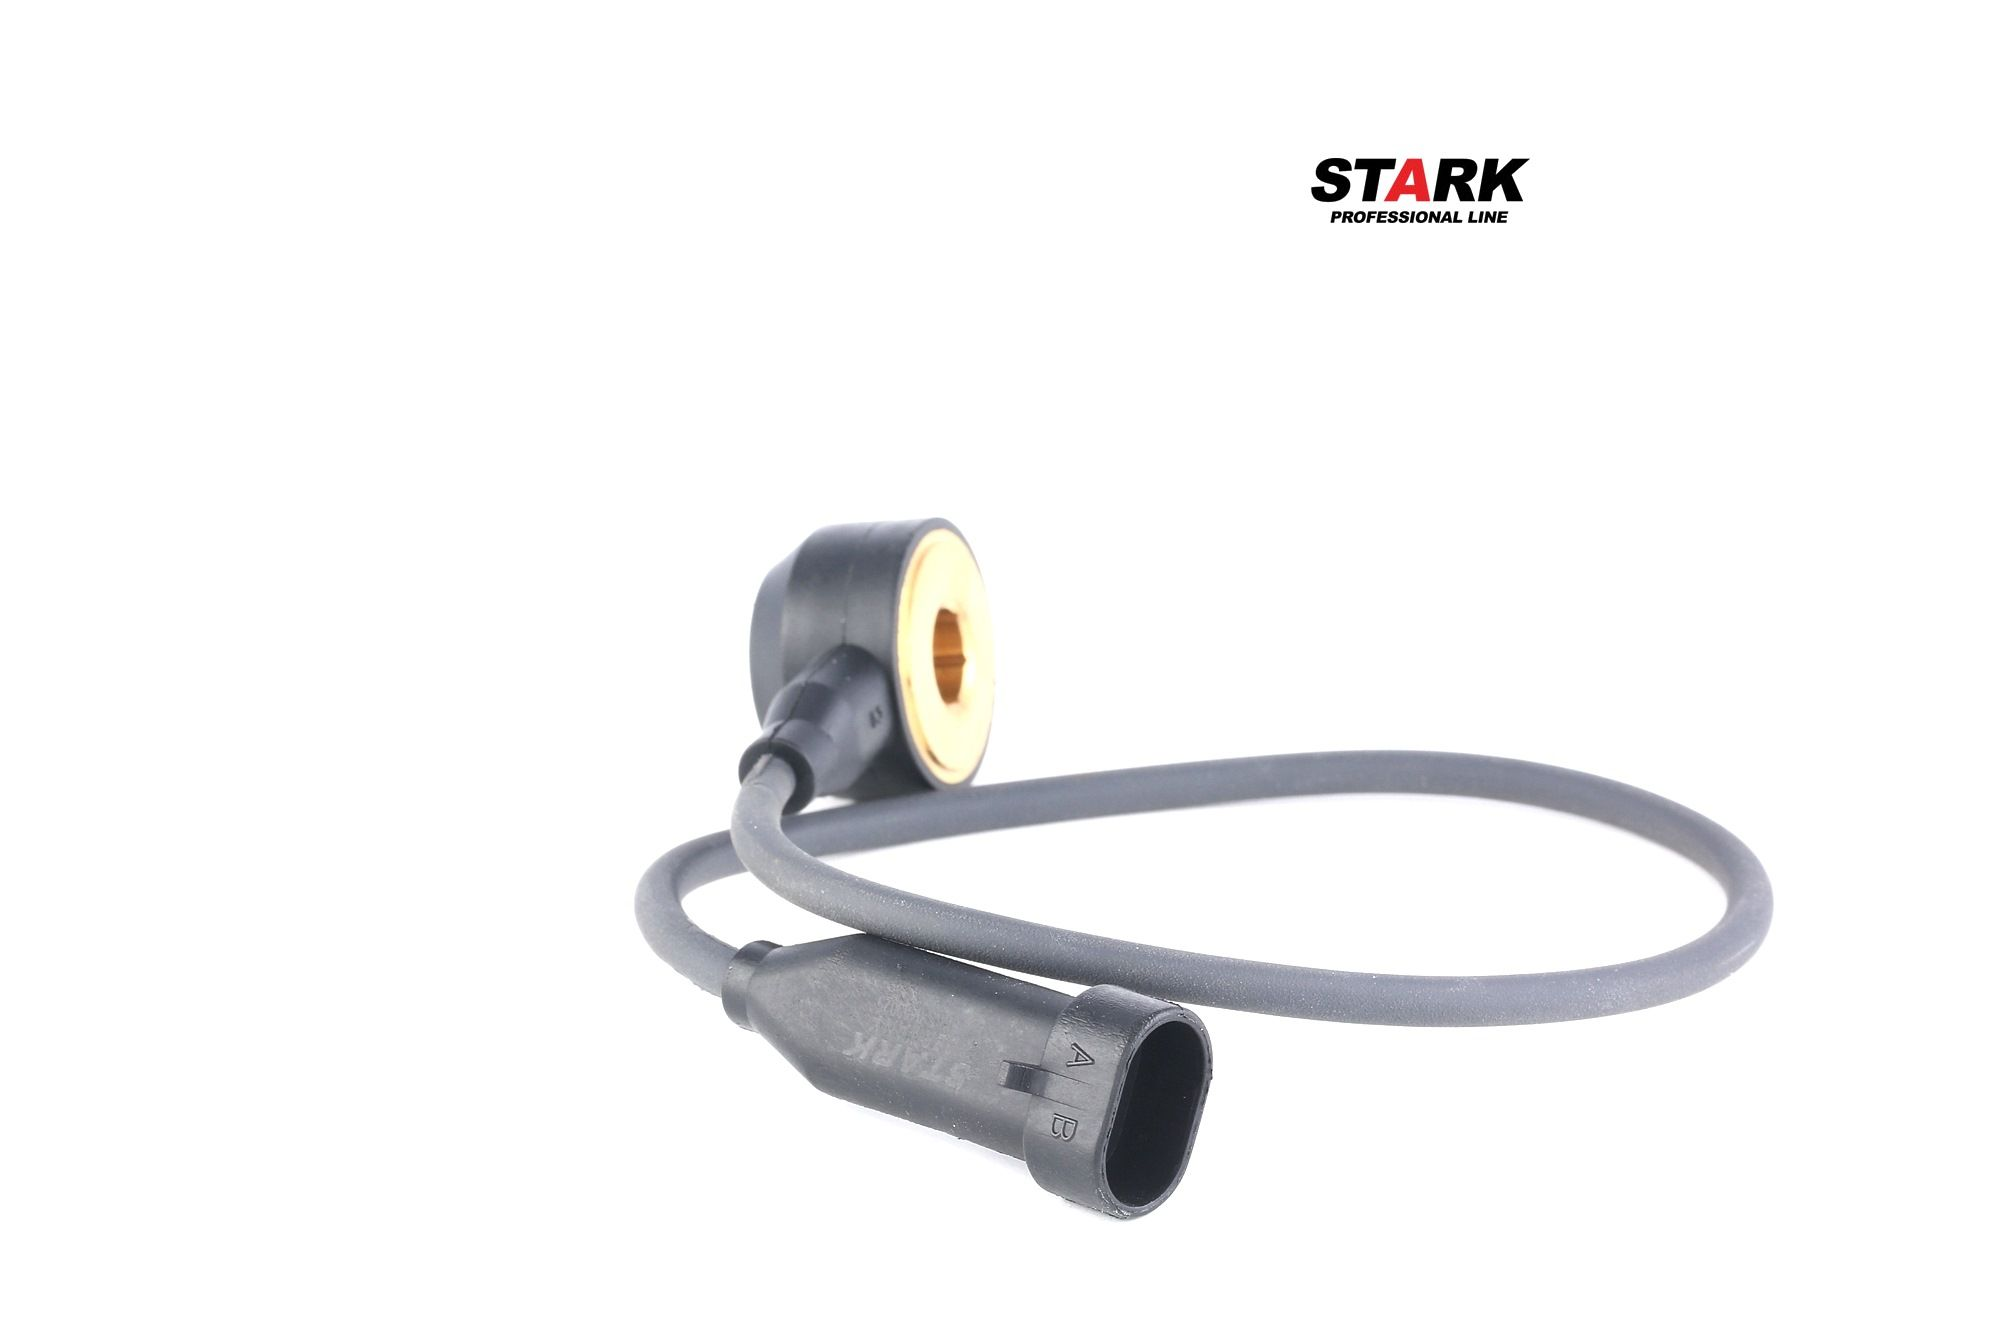 STARK Klopfsensor SKKS-0400025